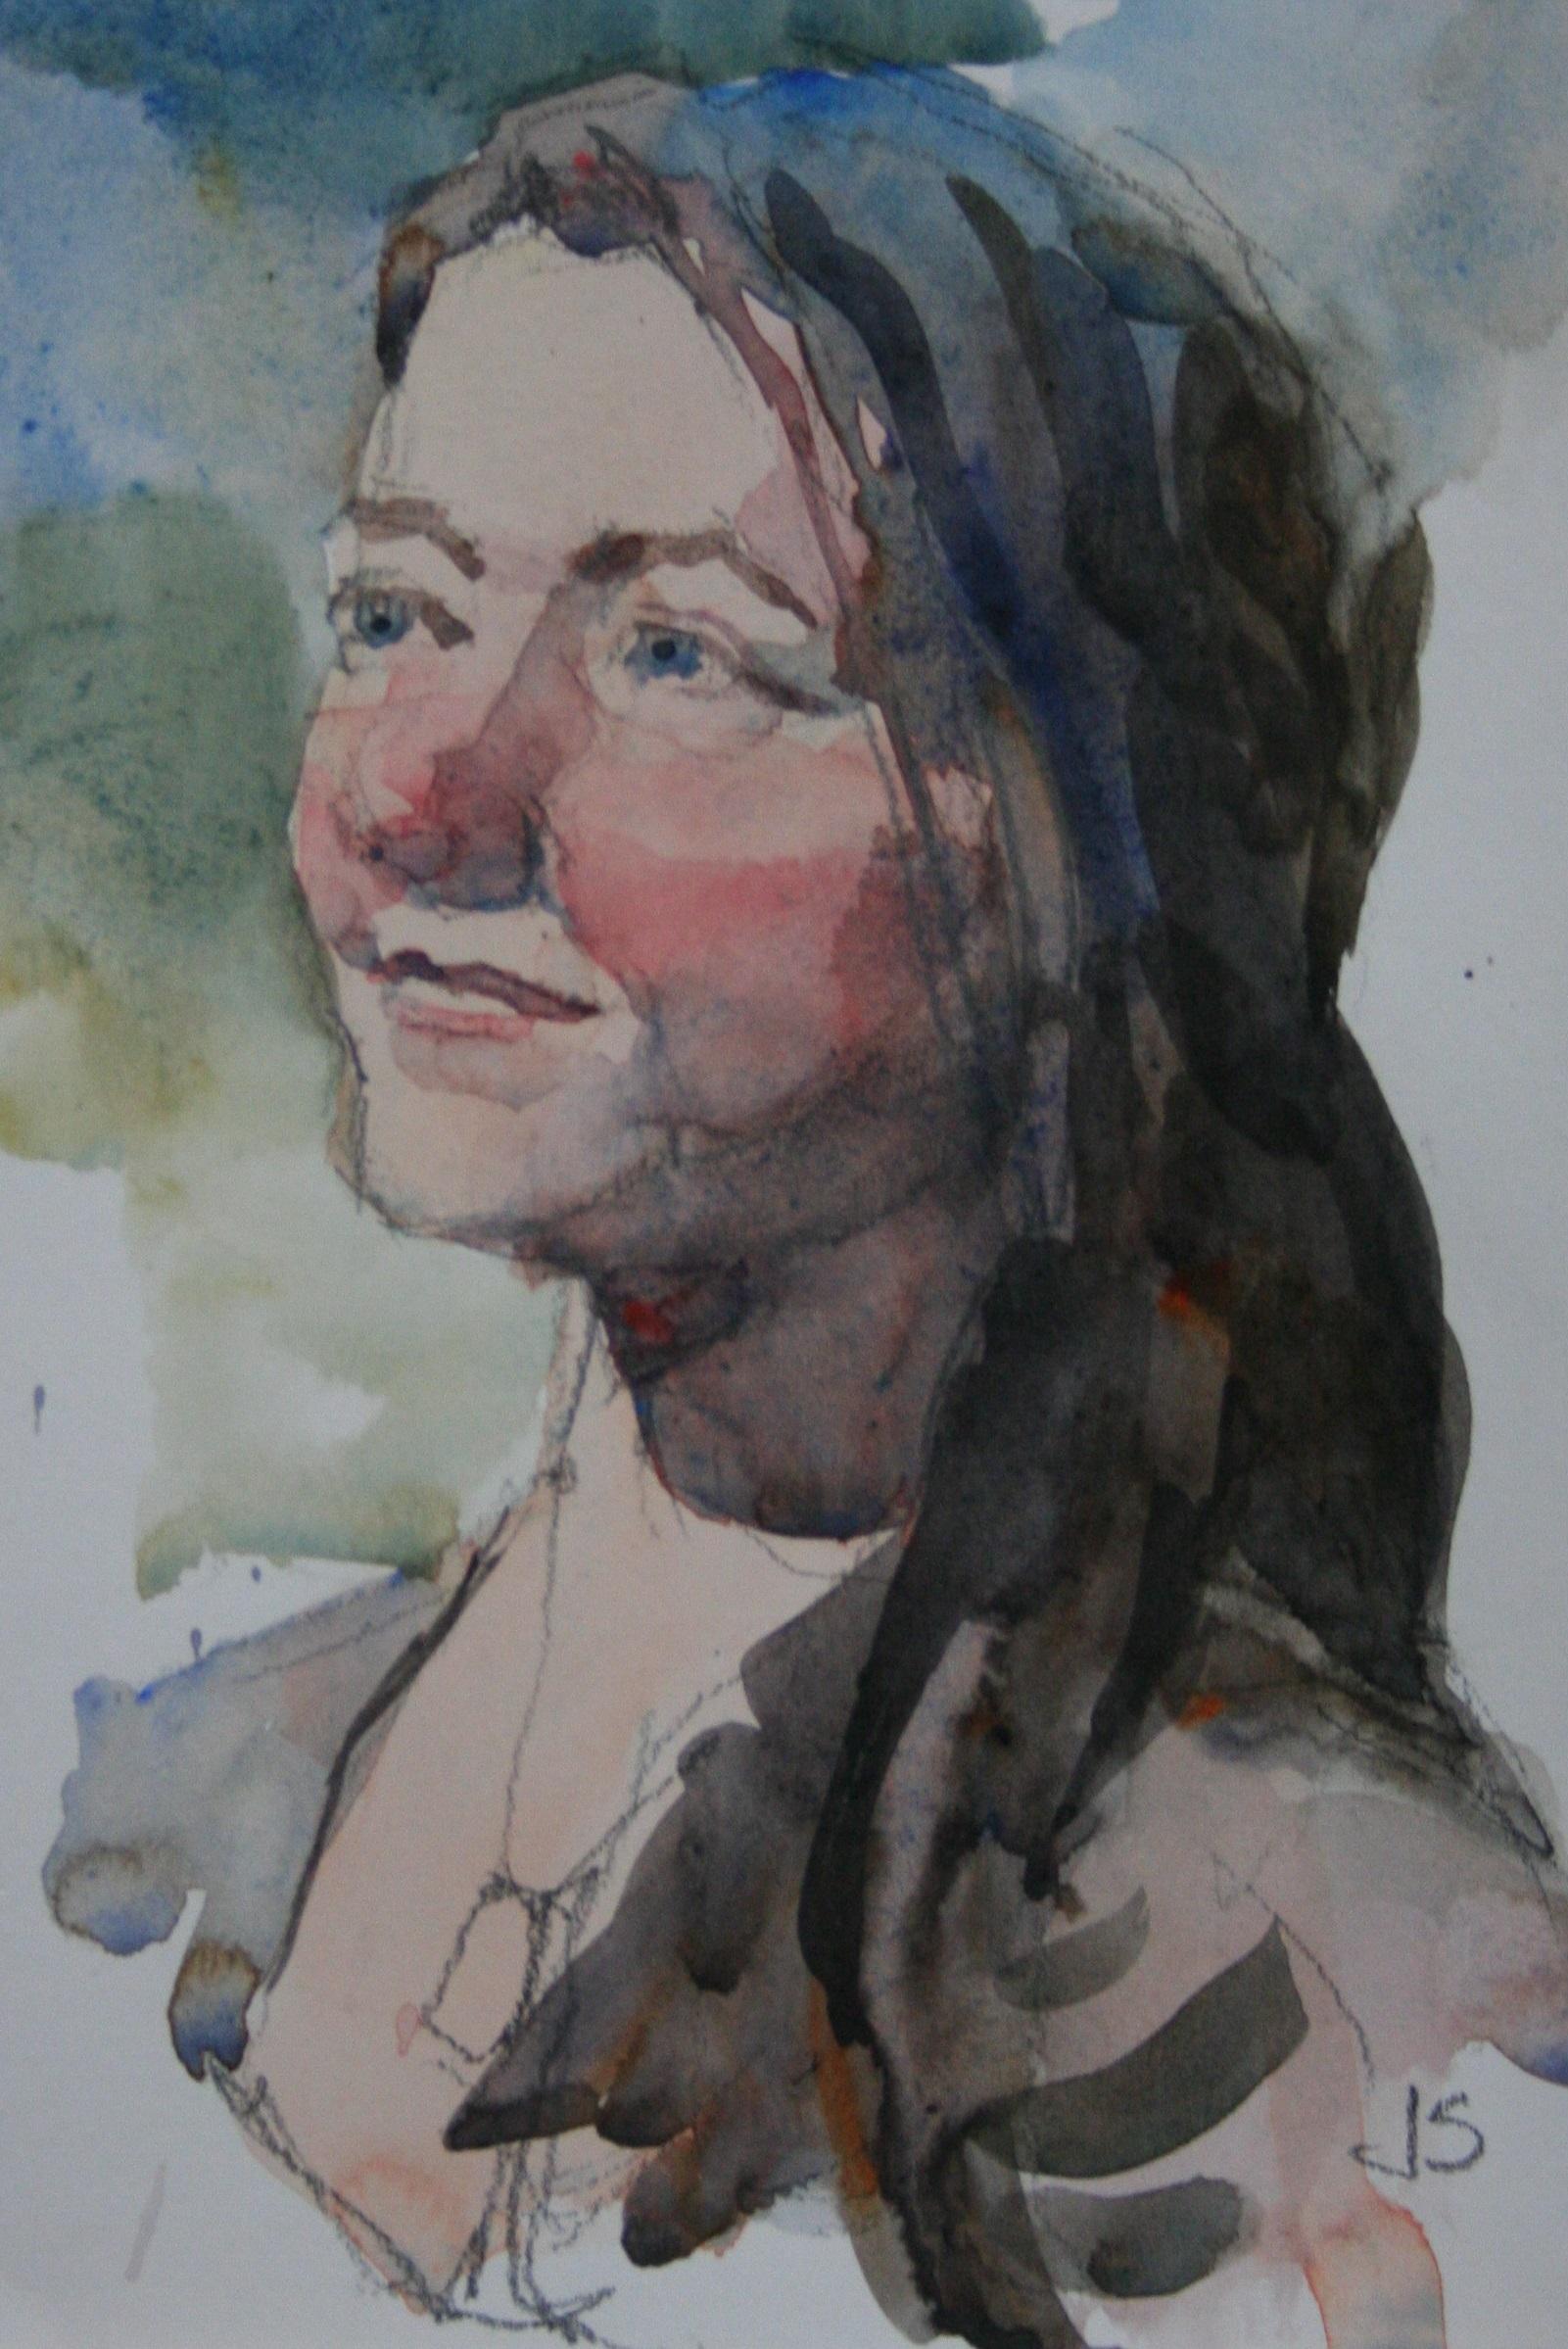 Jeff Suntala did this hour watercolor.